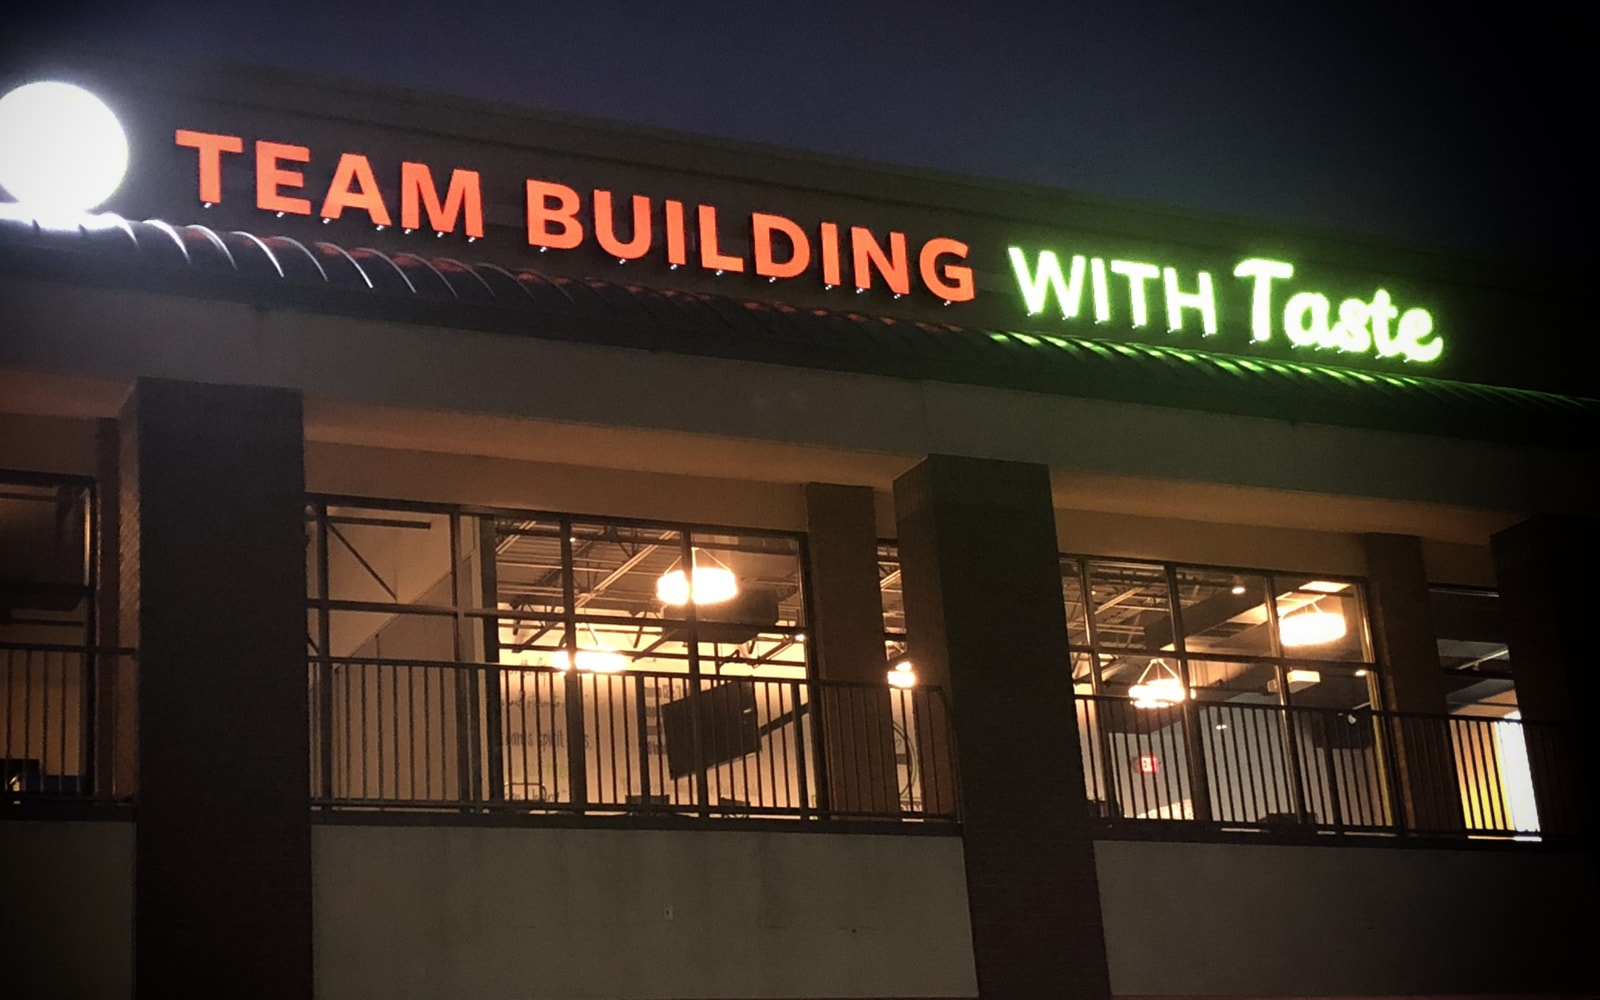 Team Building with Taste